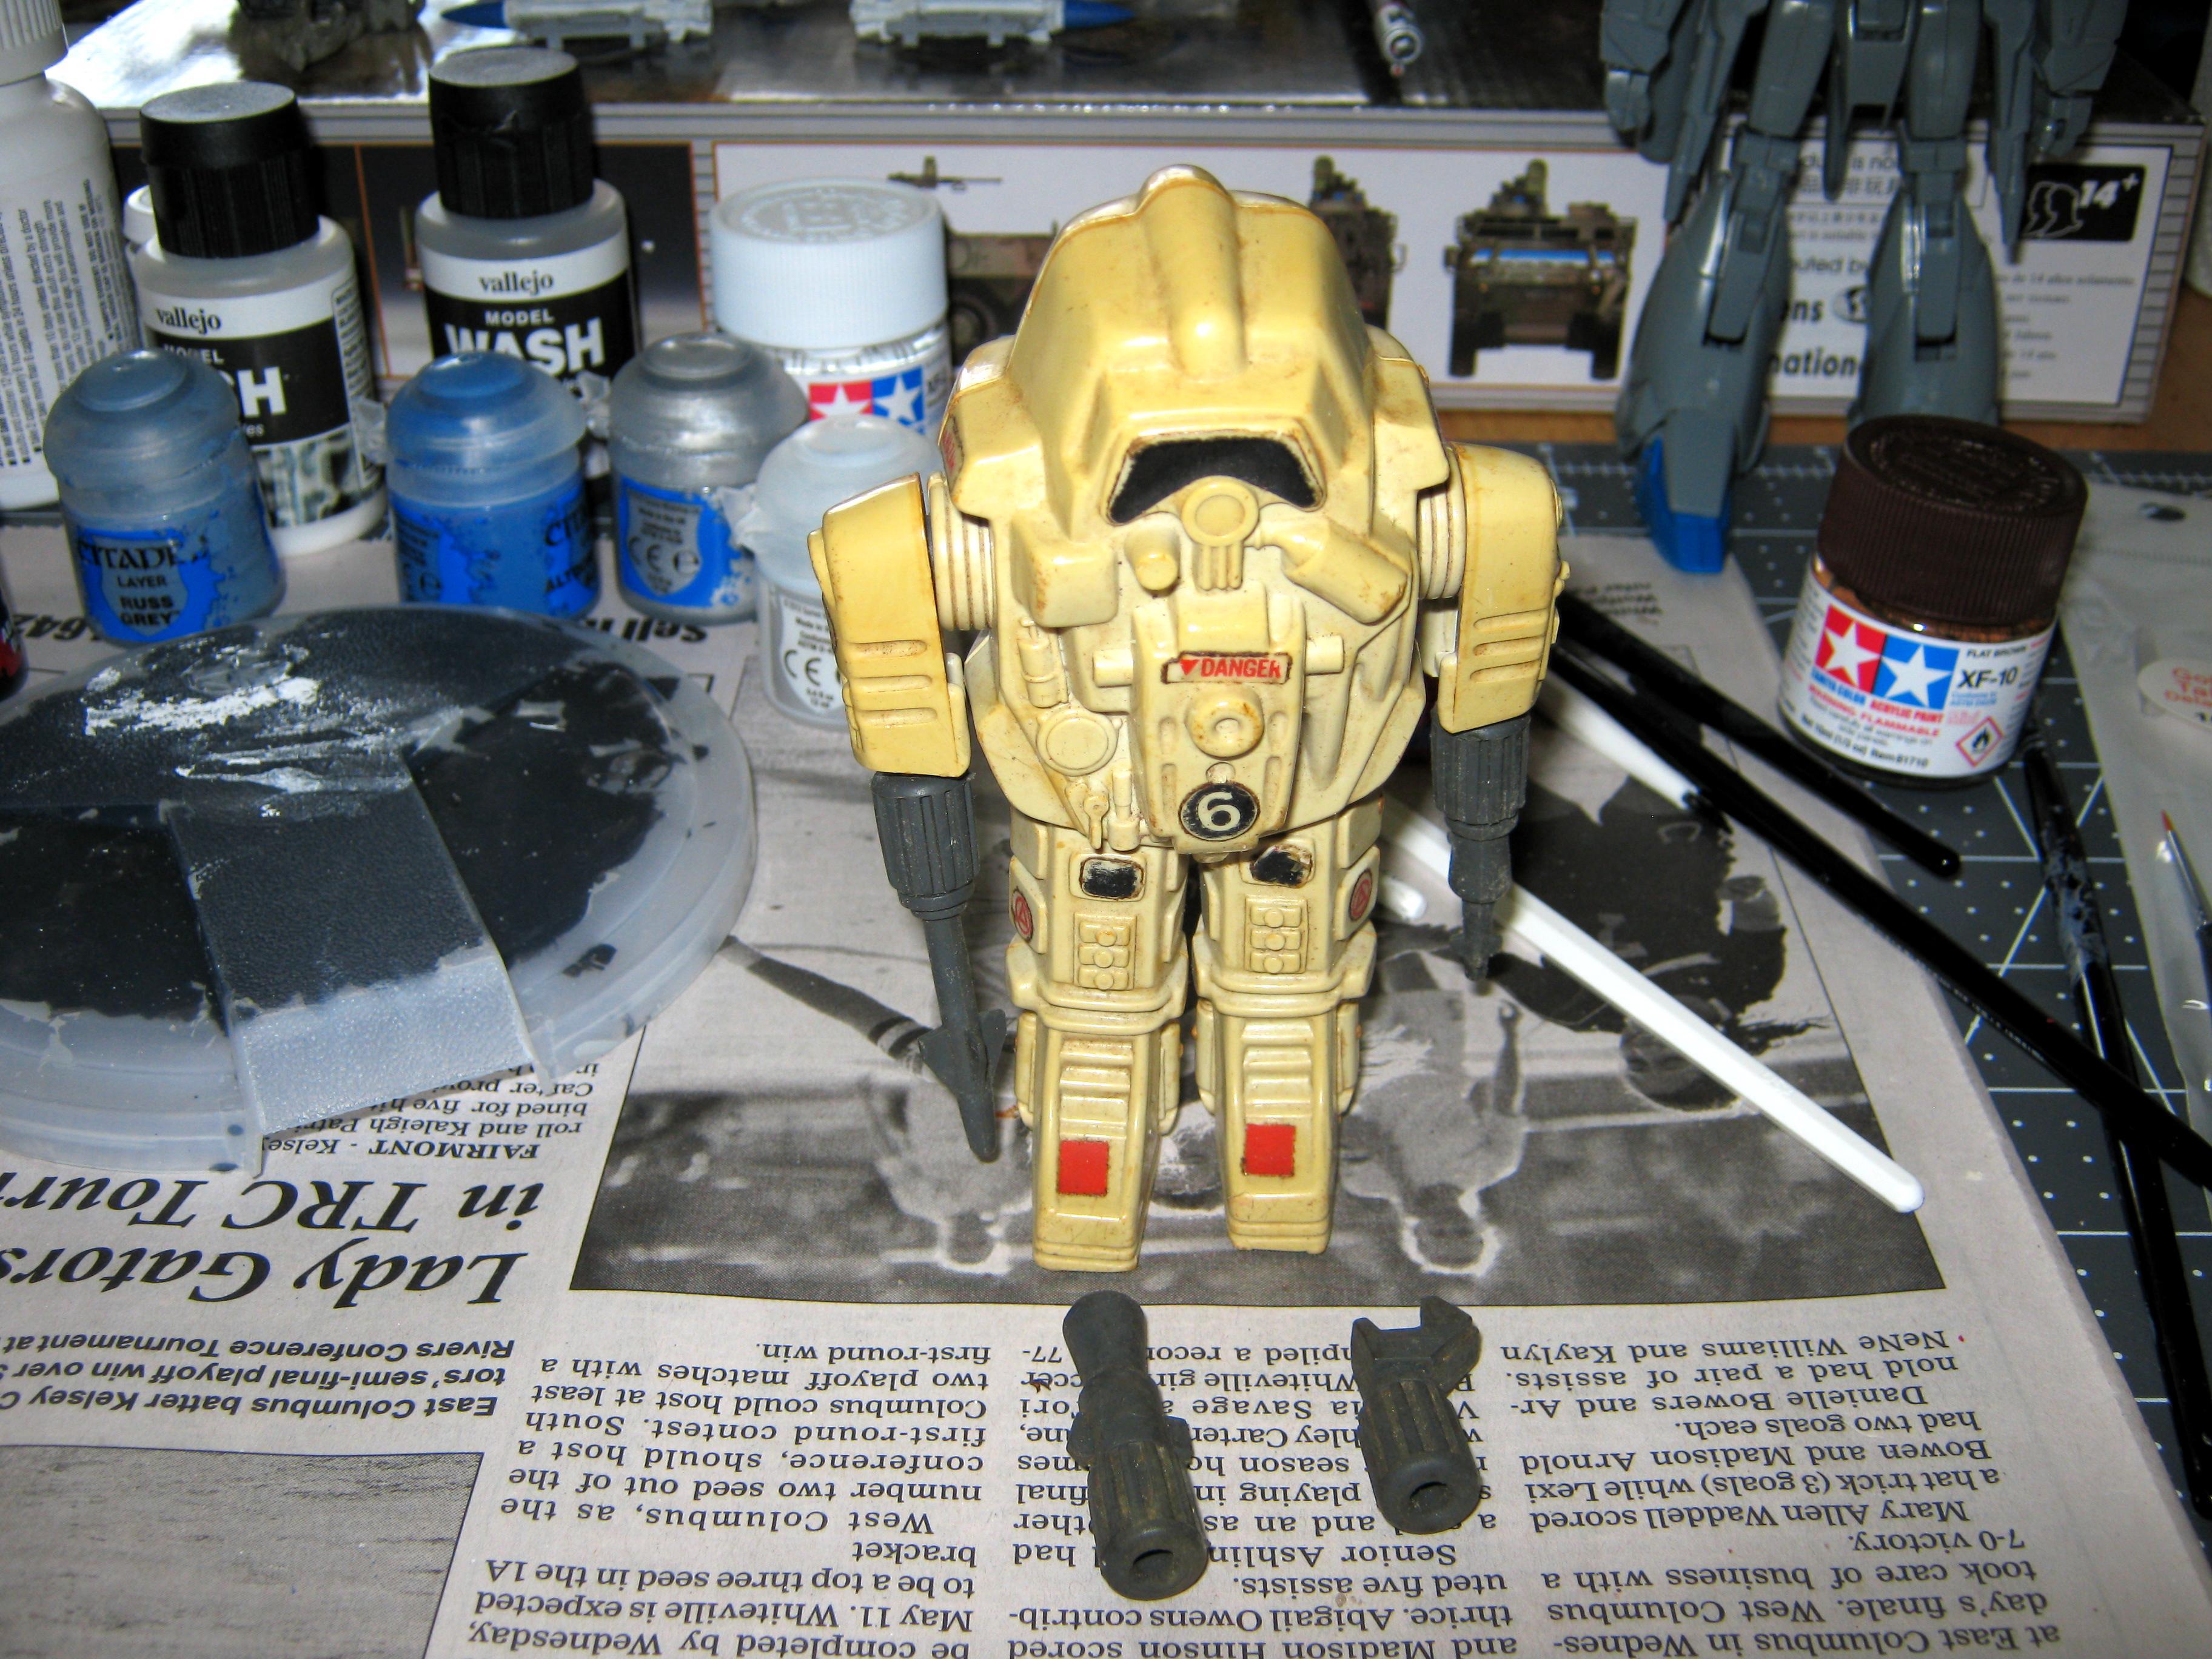 Battlesuit, Cobra, Conversion, G.i. Joe, Imperial Navy, Power Lifter, Powered Armor, Toy